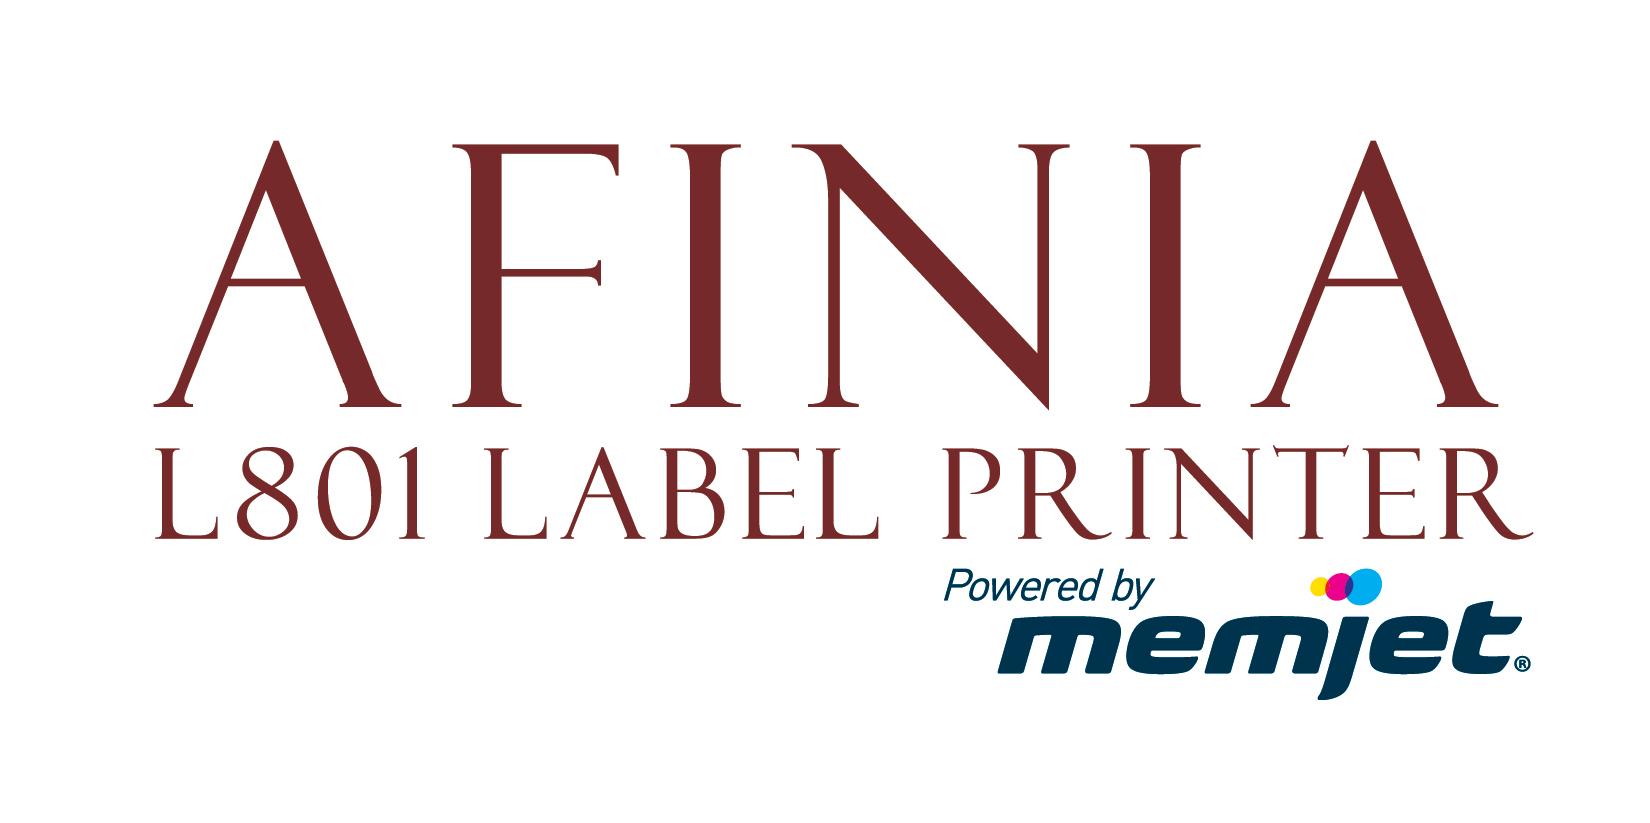 afinia-l801-memjet-logo-color.jpg